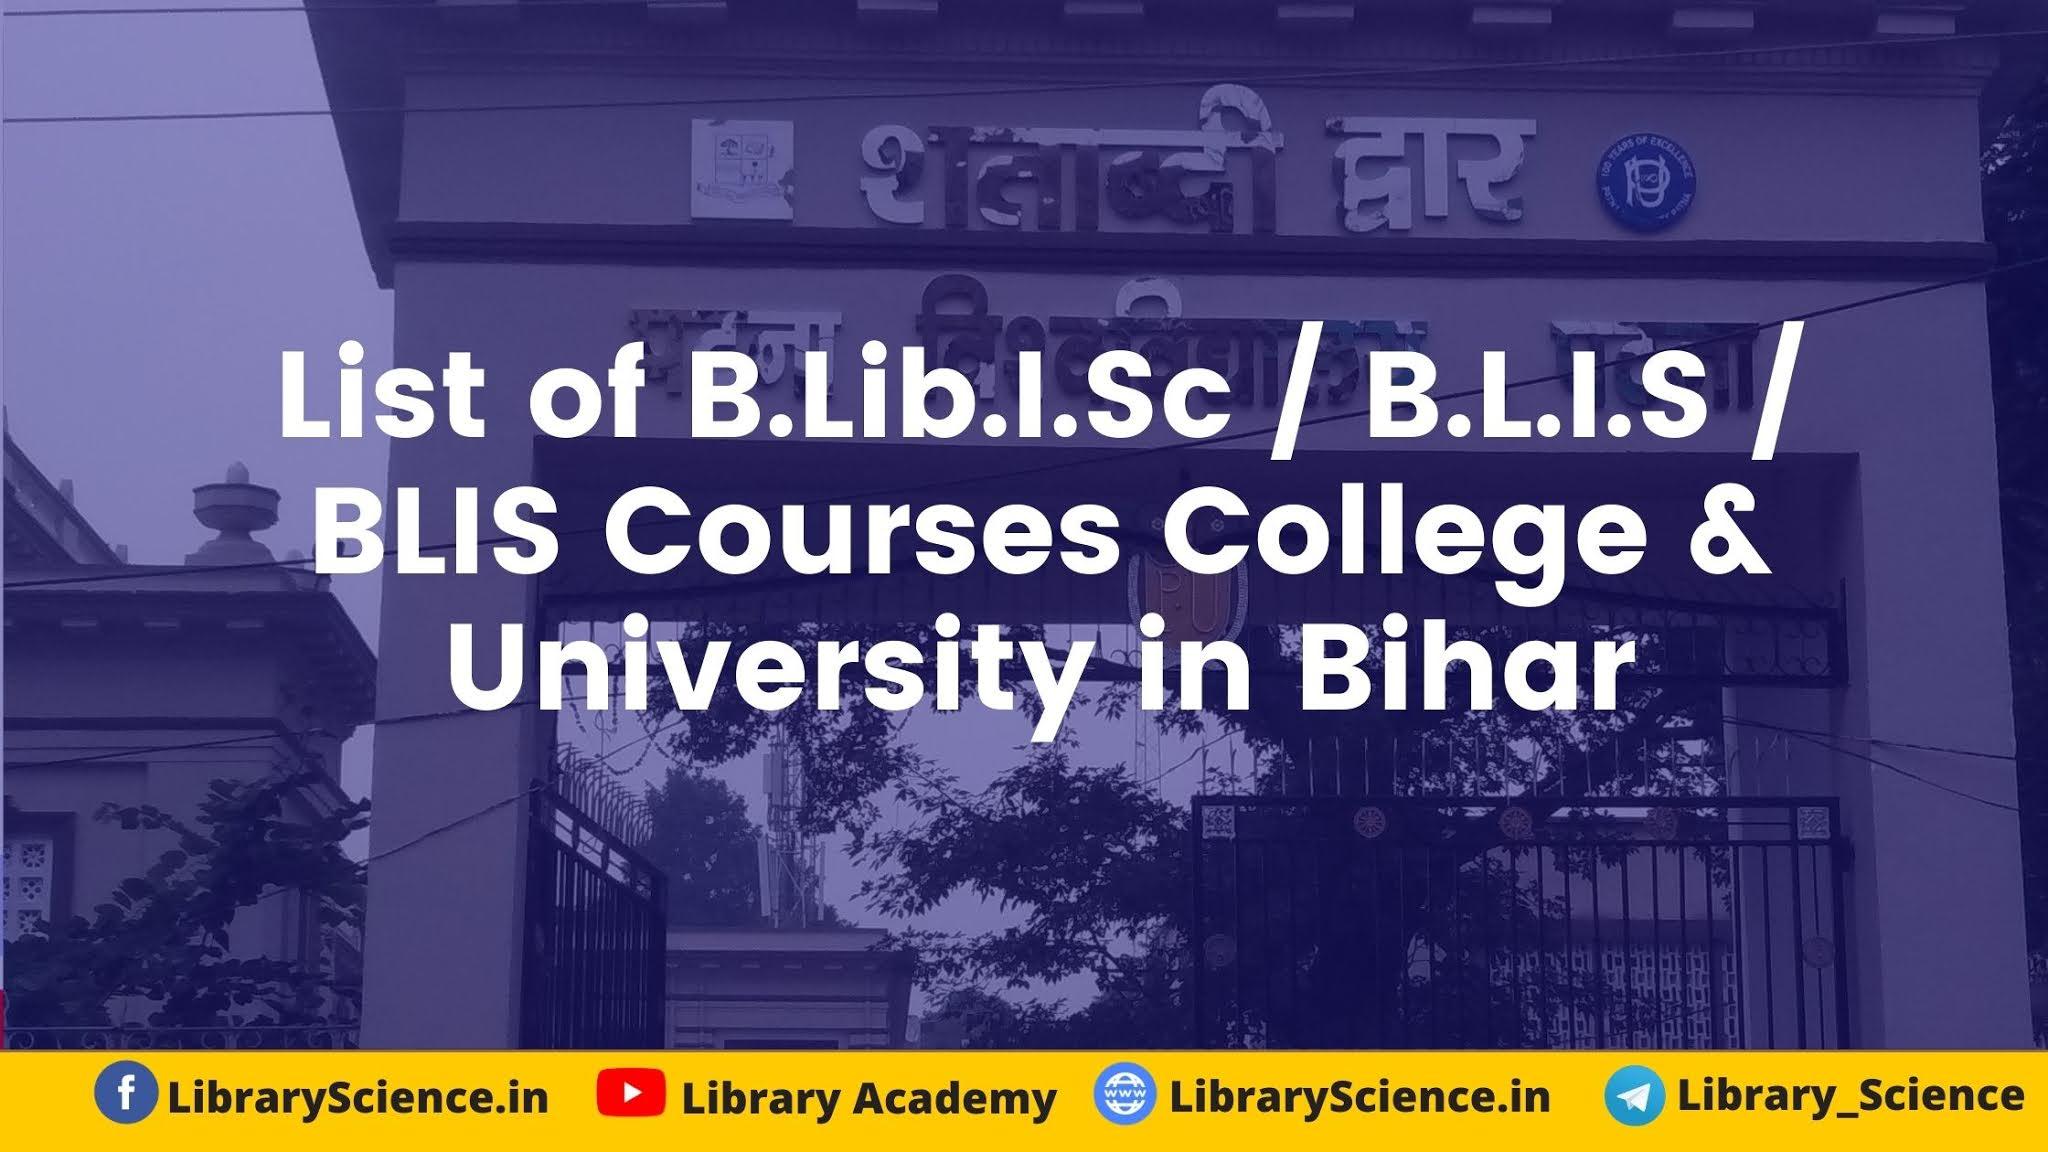 BLIS Course College in Bihar